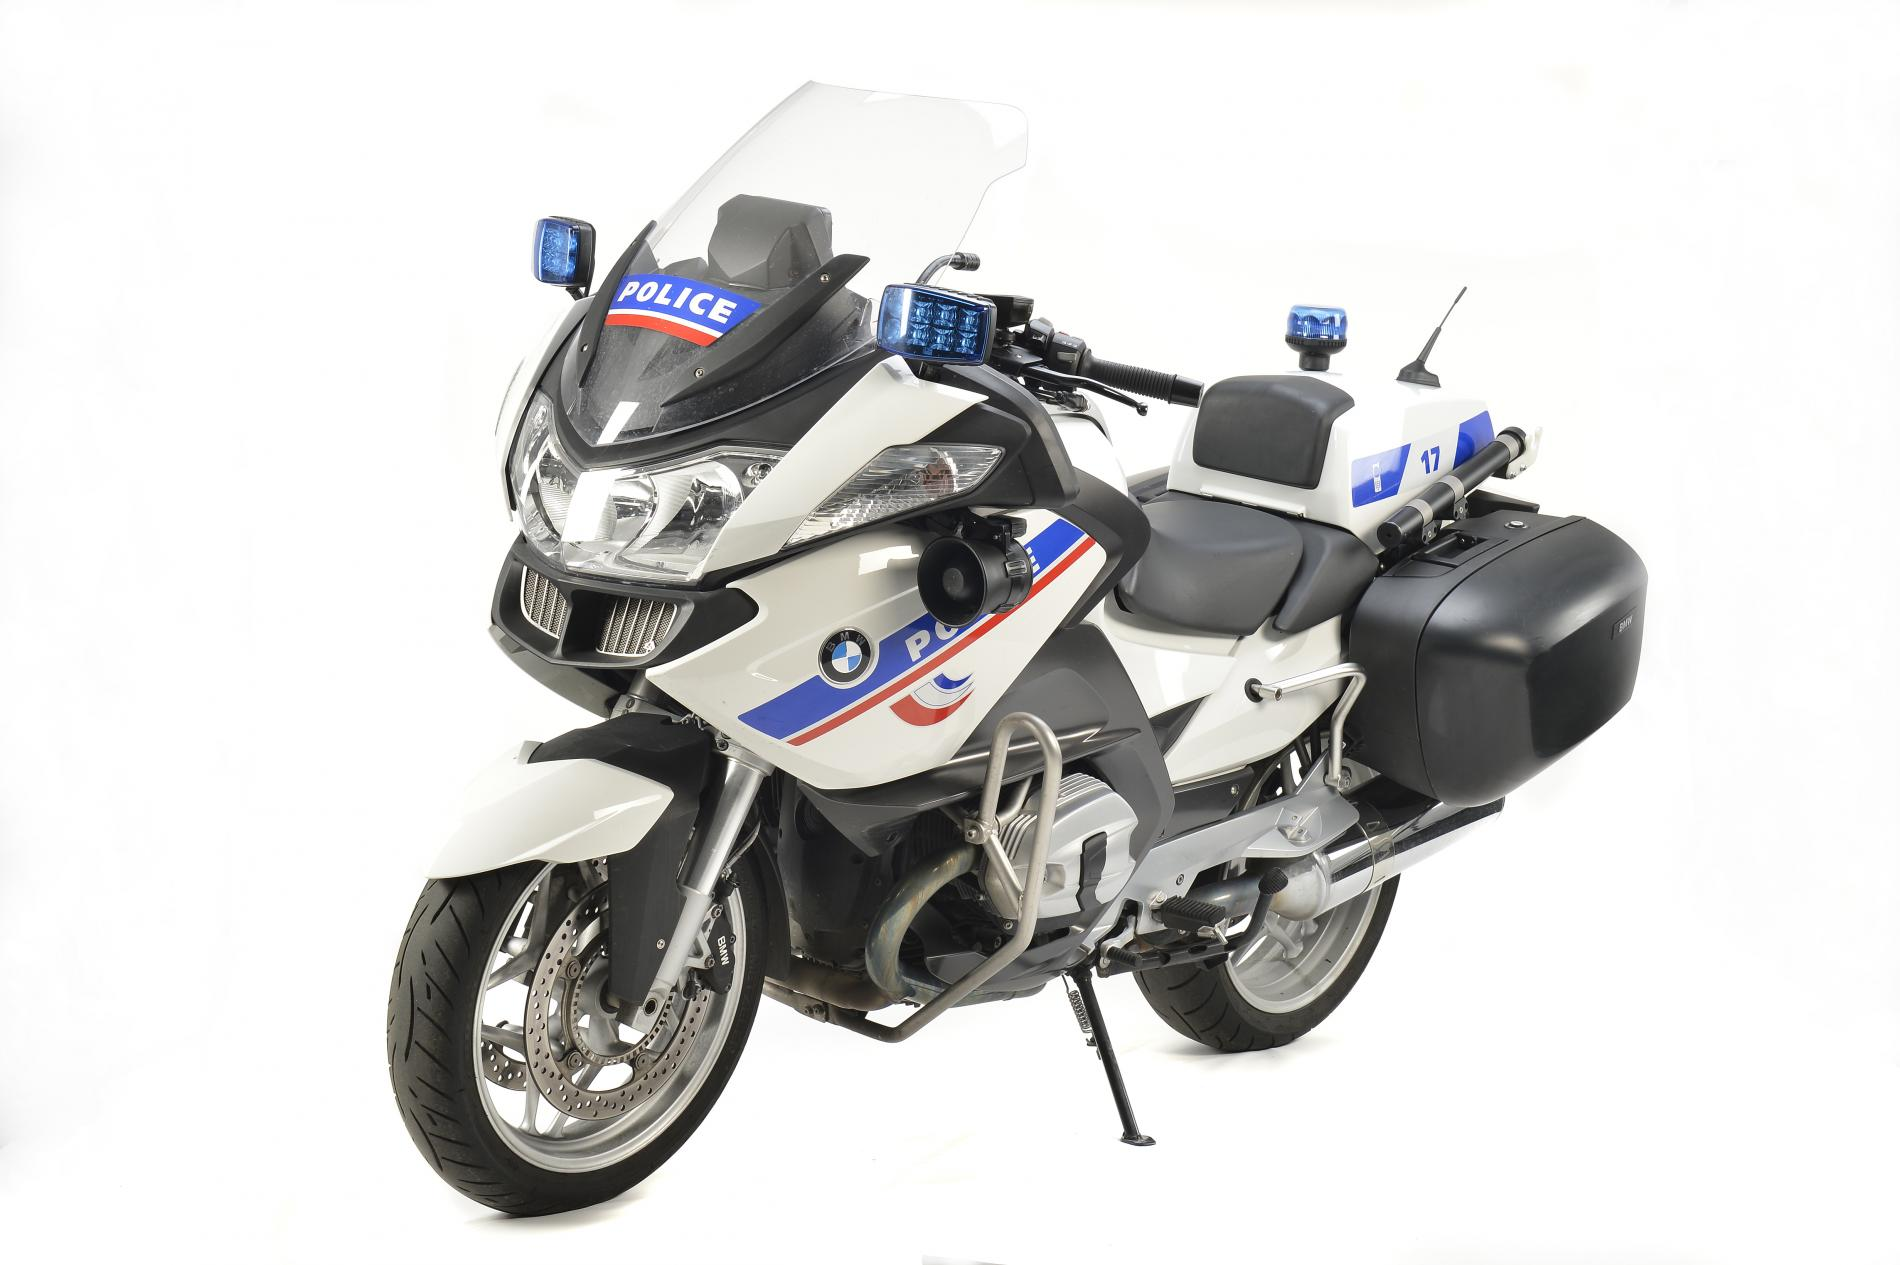 Bmw R1200rt Police Nationale Moto Bmw